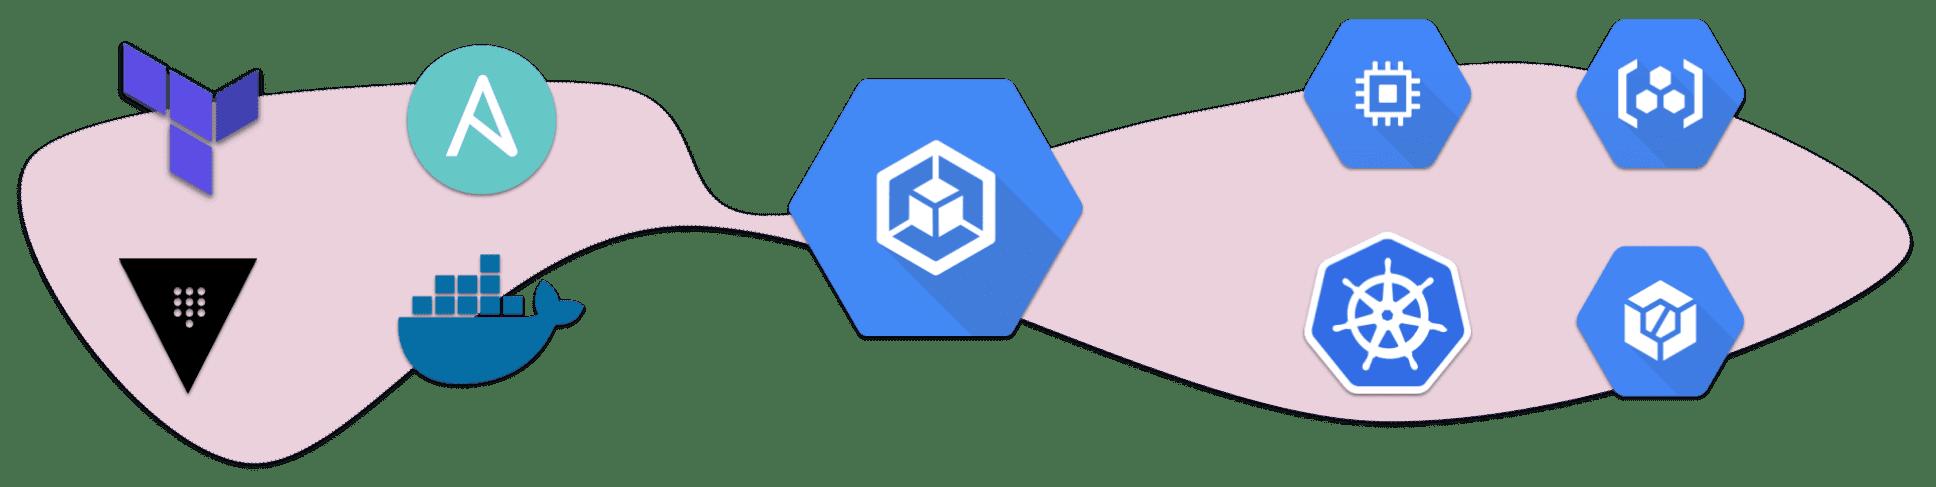 GCP ecosystem integrations